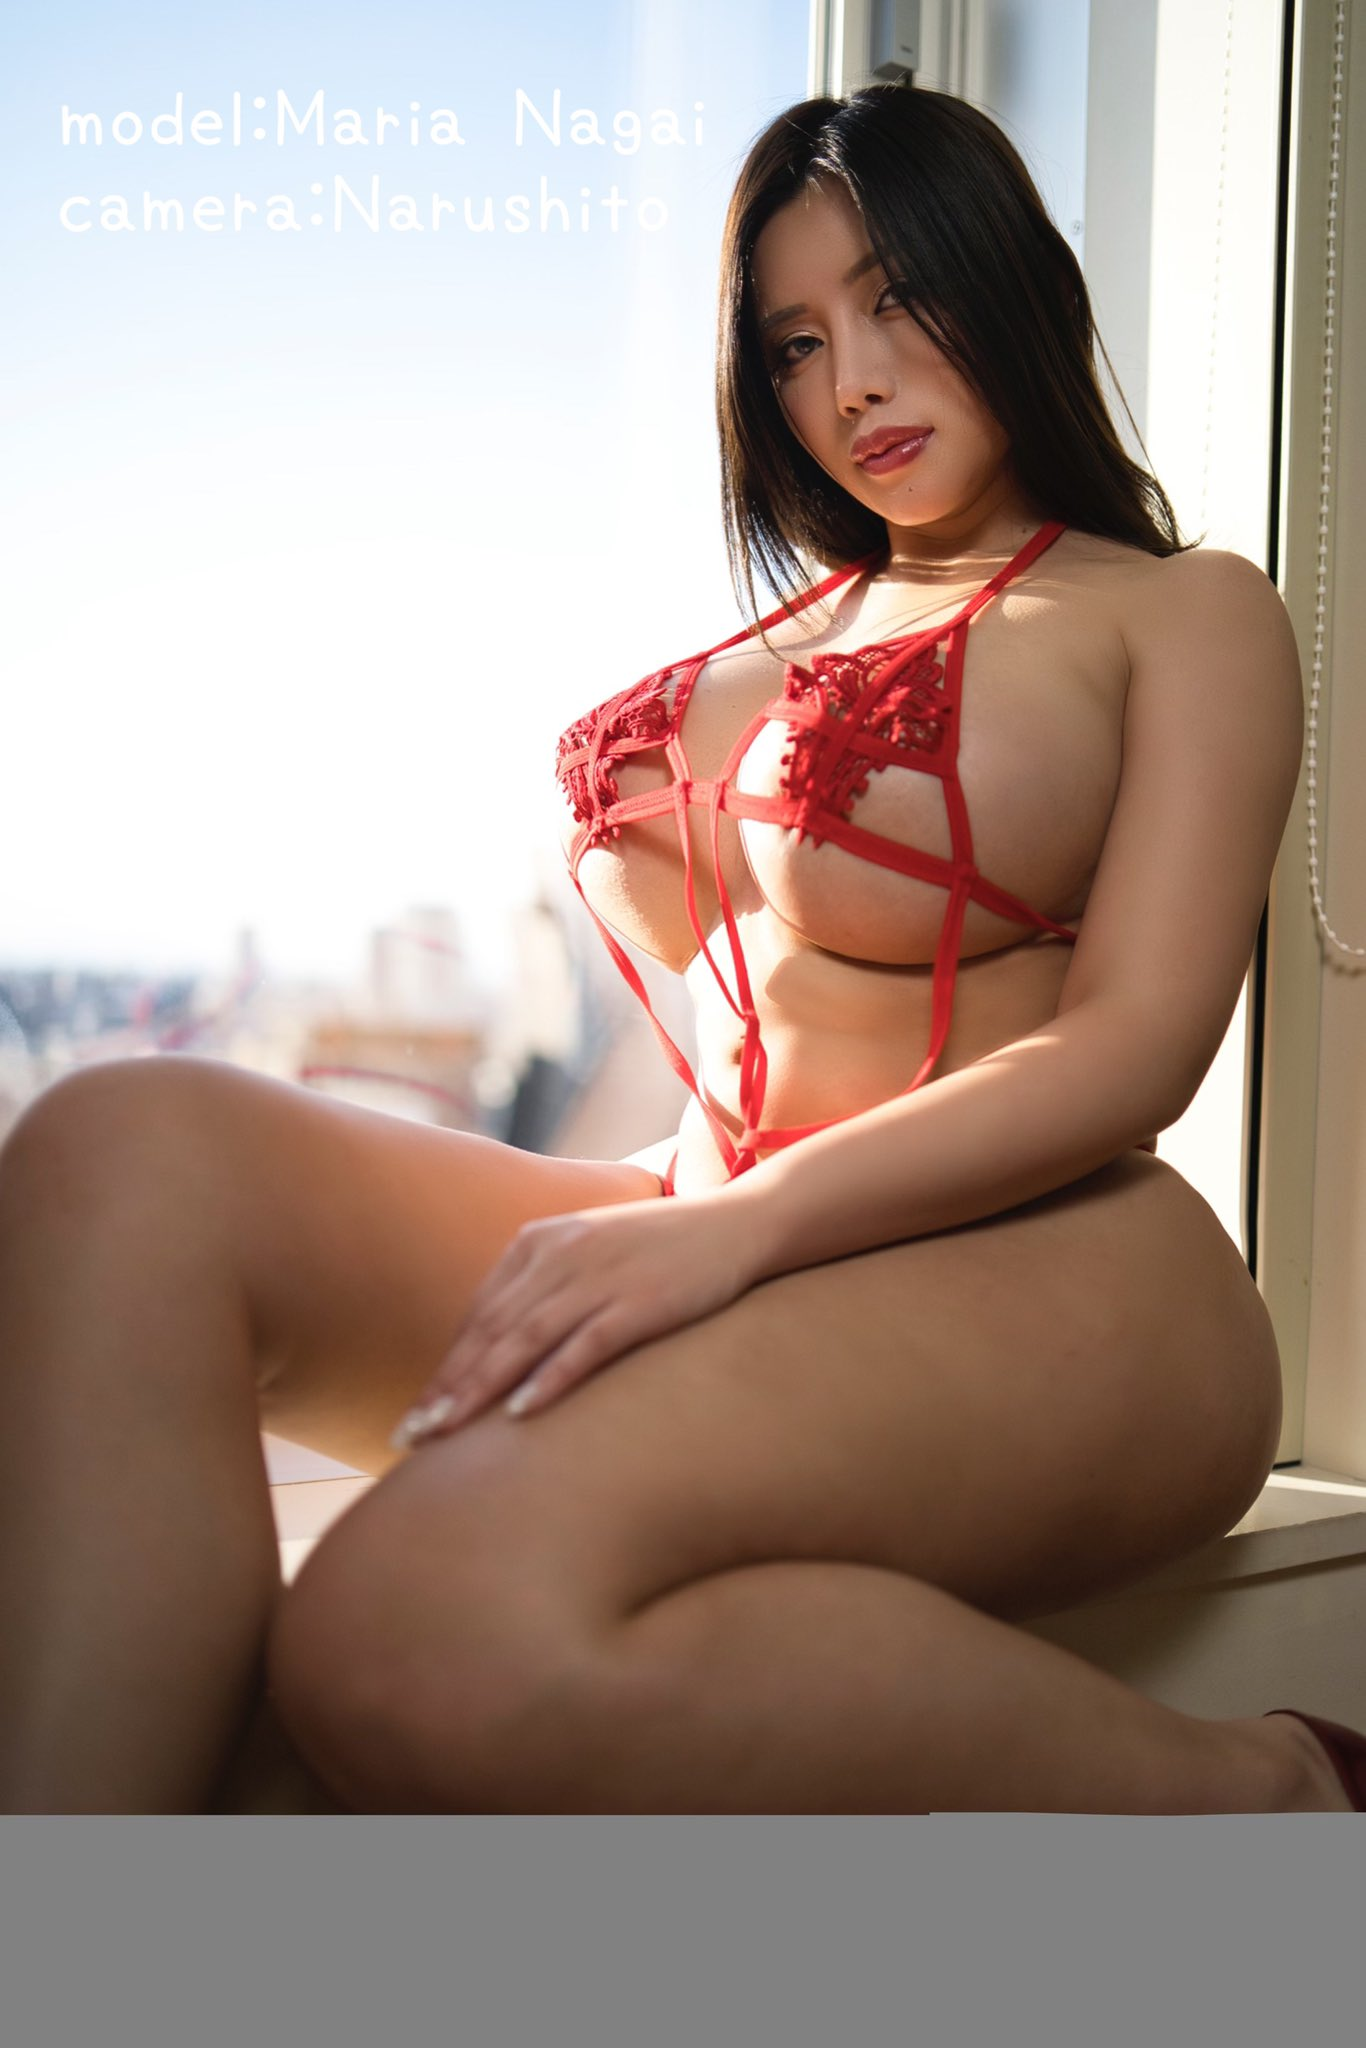 Nagai Maria Nude Leaked (3 Videos + 136 Photos) 297